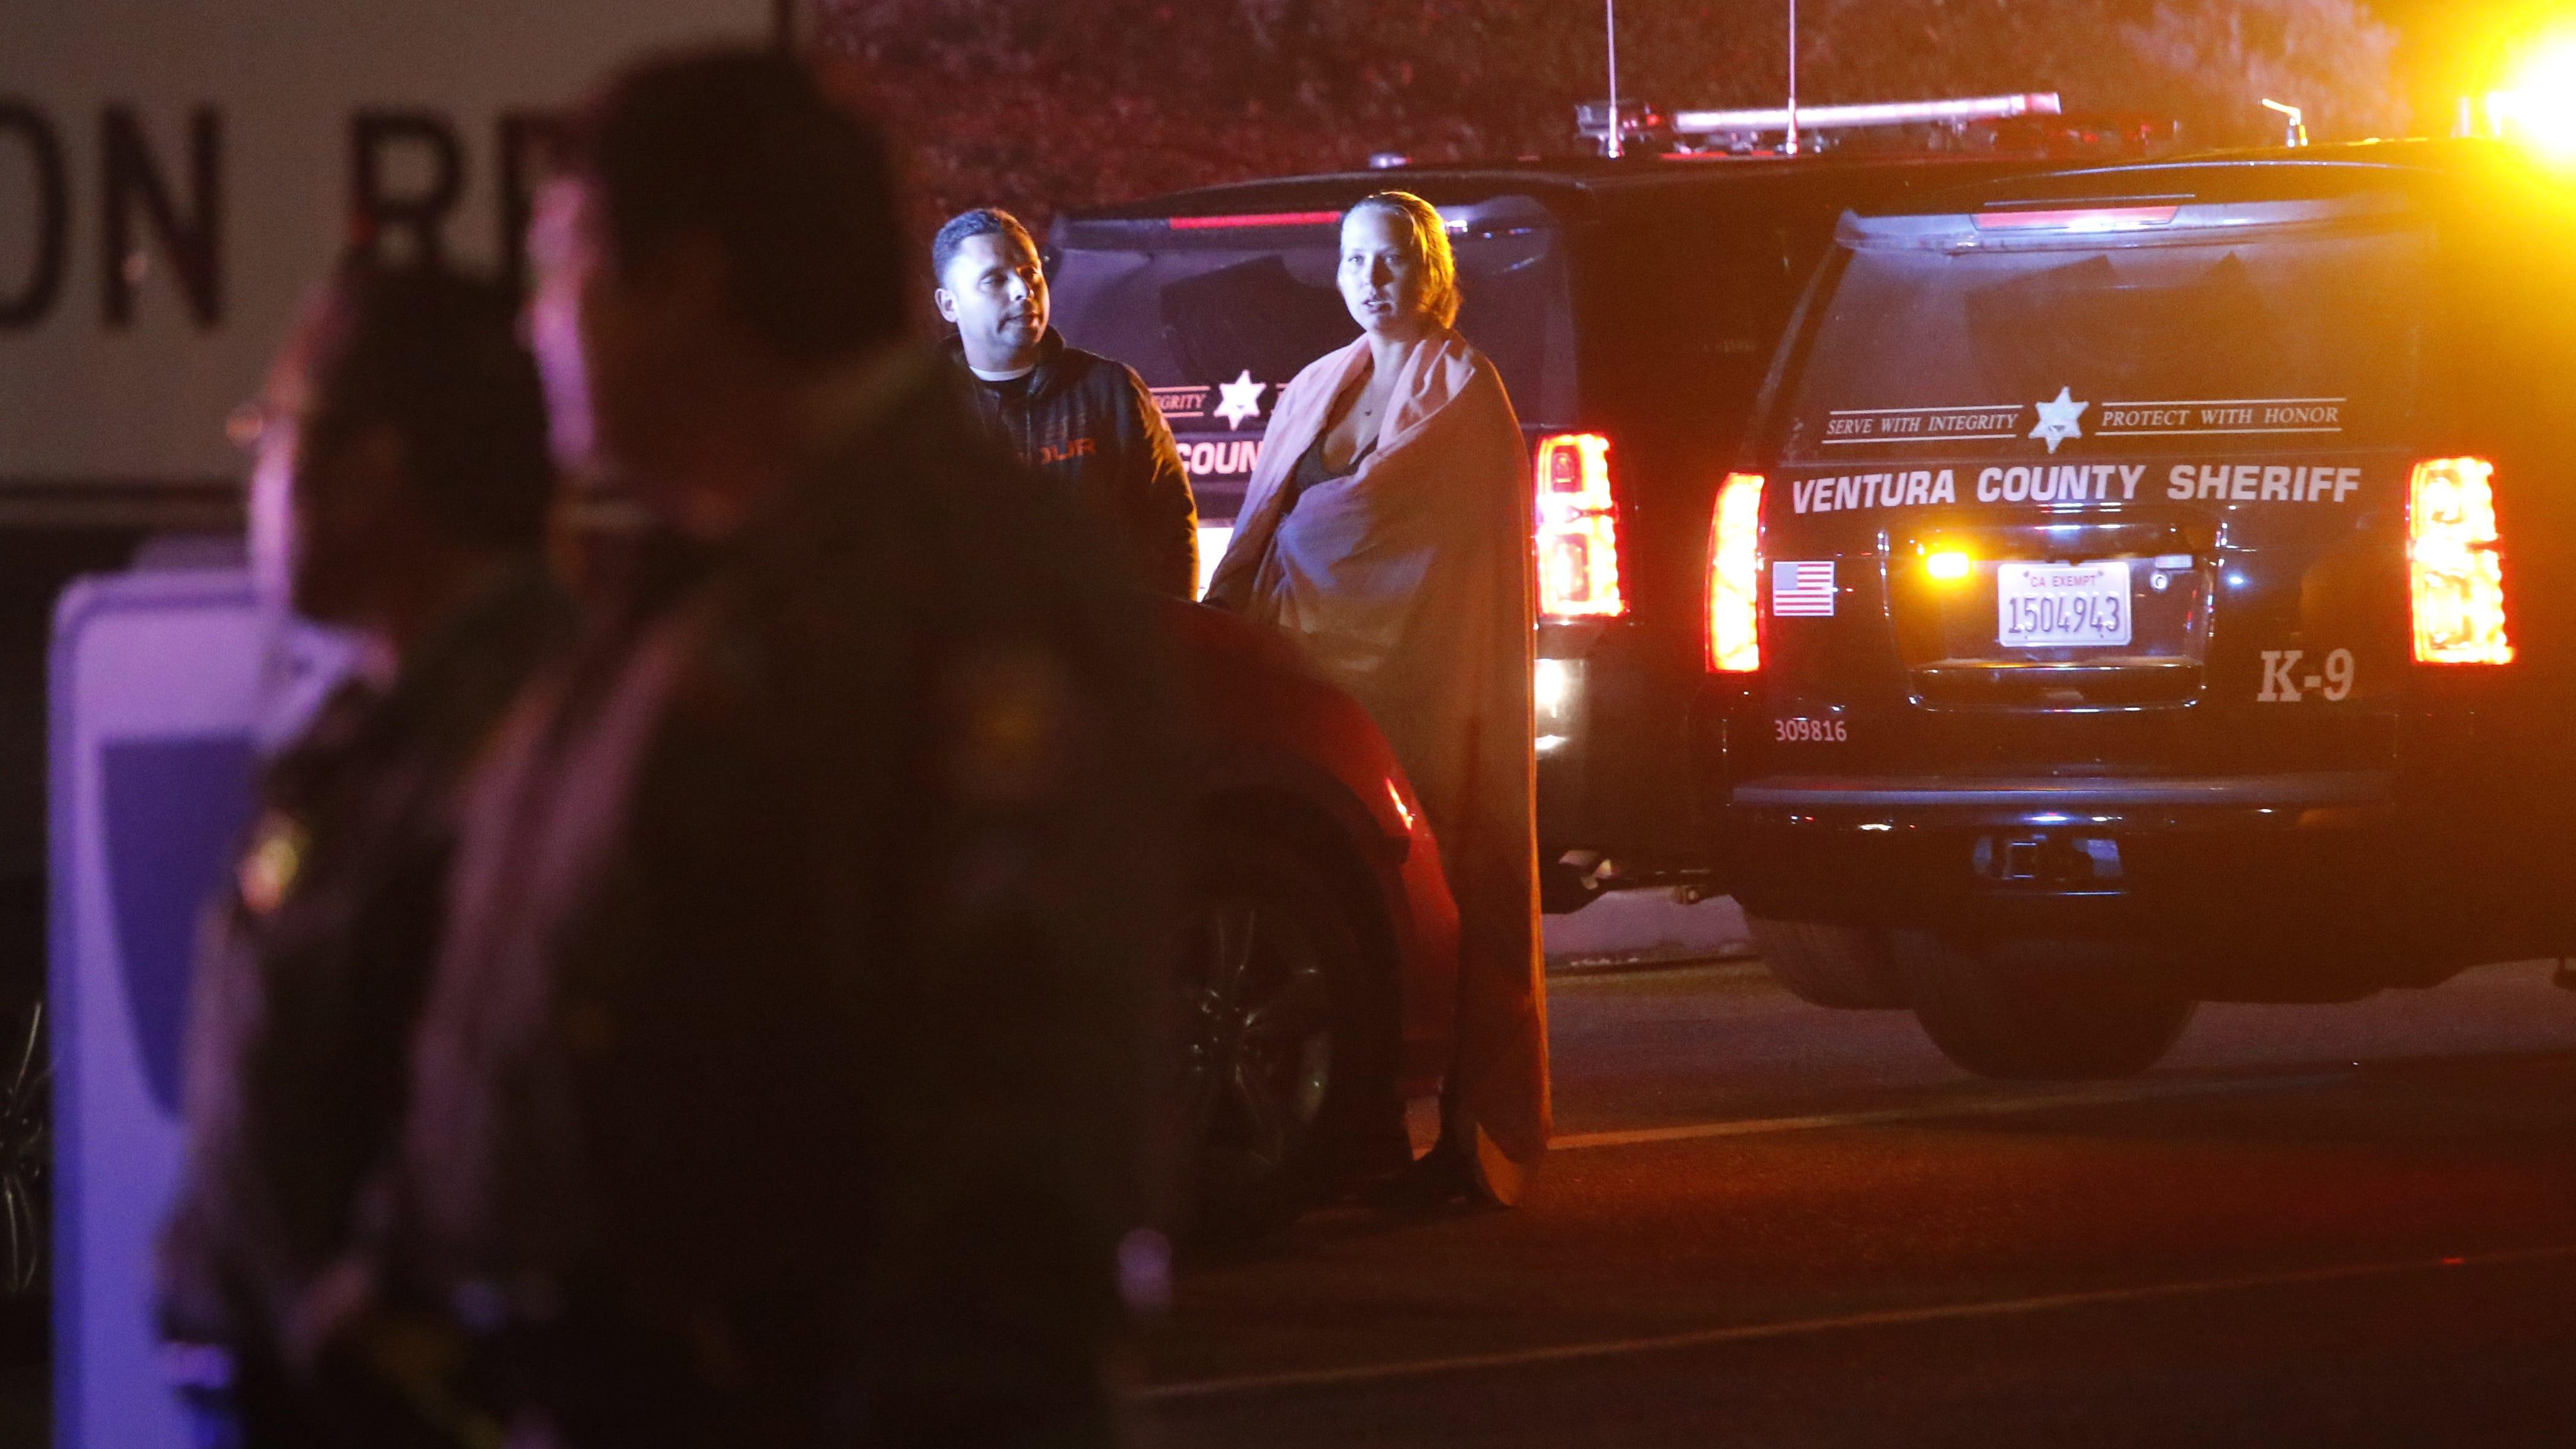 Live Stream Shooting Wallpaper: Thousand Oaks Shooting Kills Twelve, Live Stream